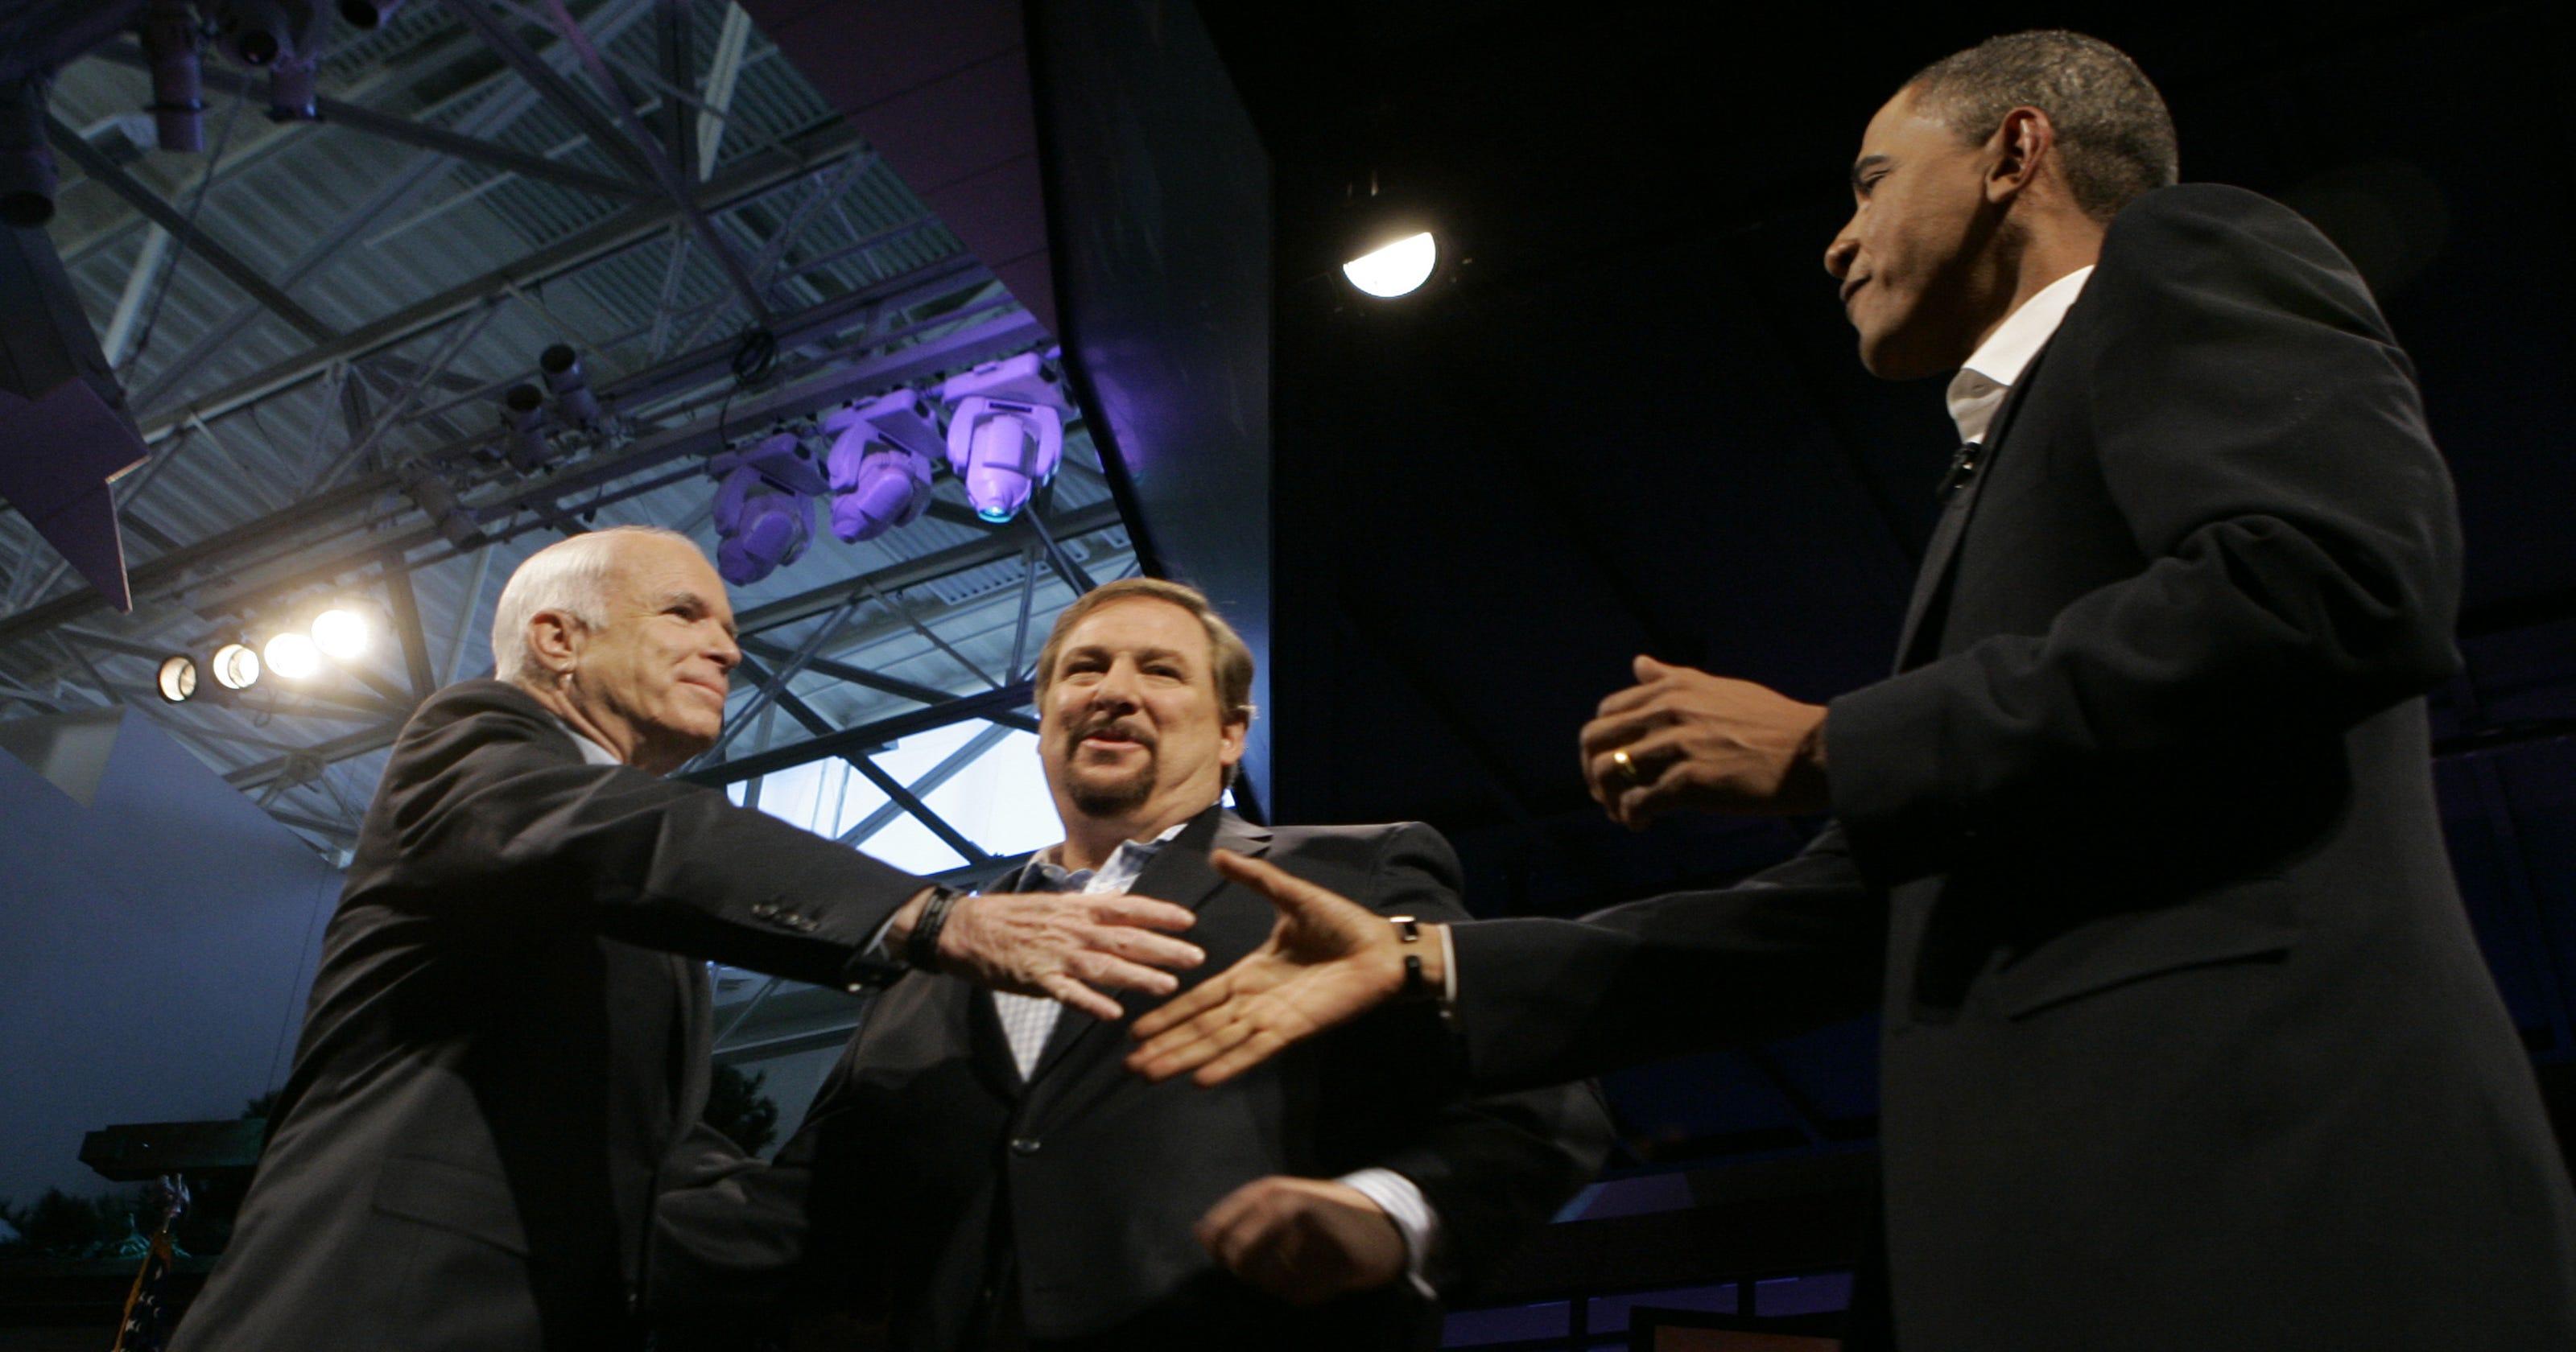 John McCain takes on Barack Obama in the 2008 presidential election